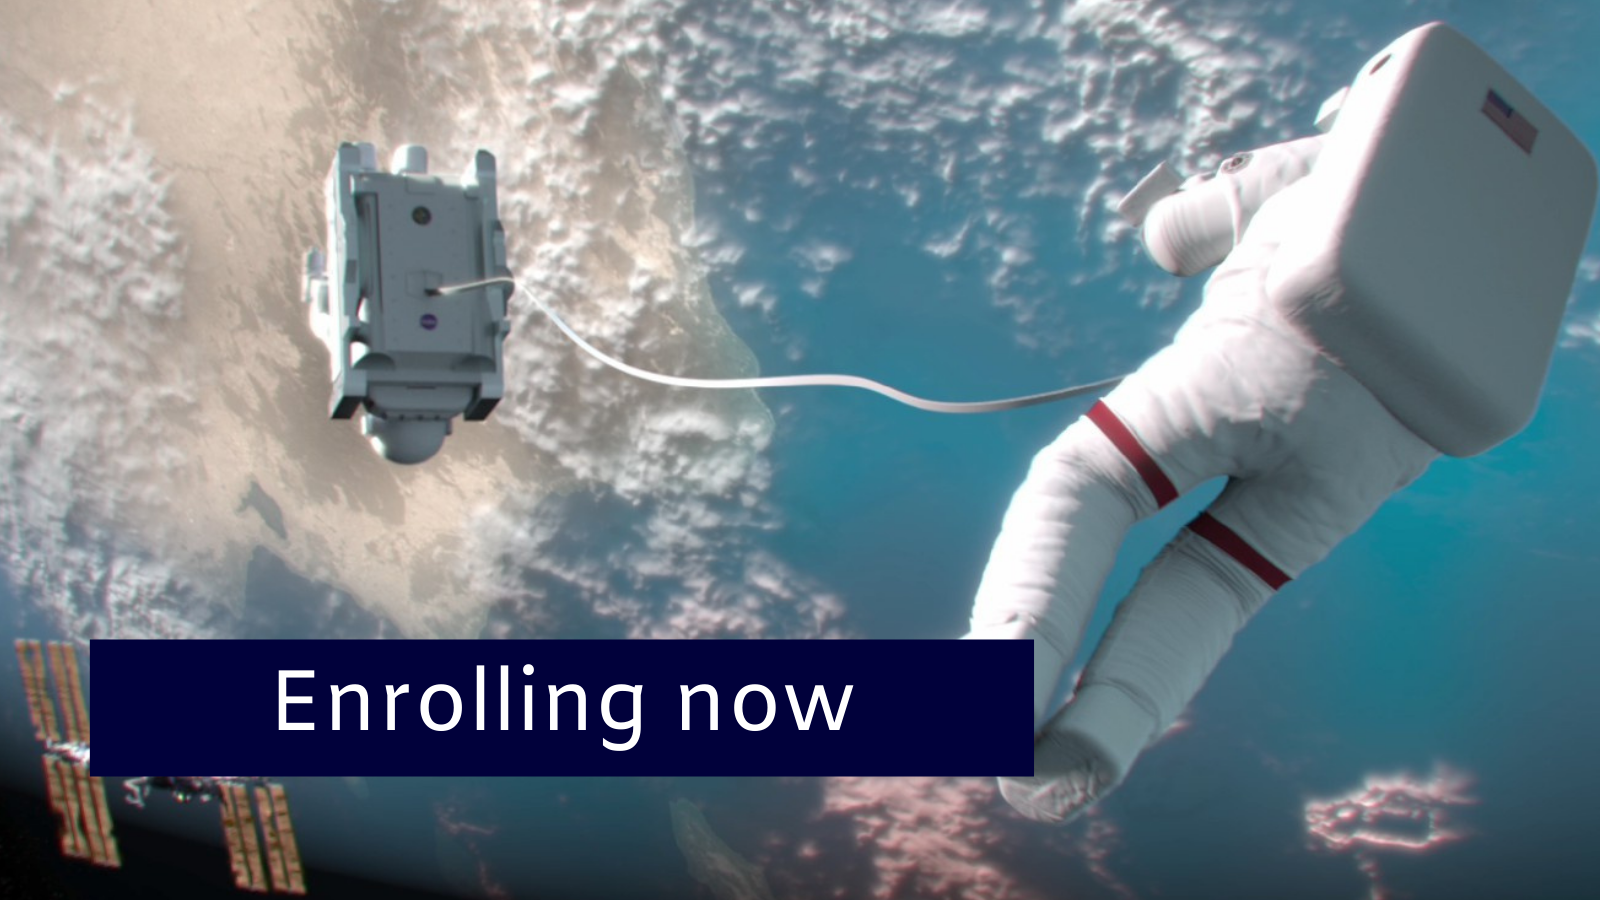 FB_Gravity_Enrolling_Now